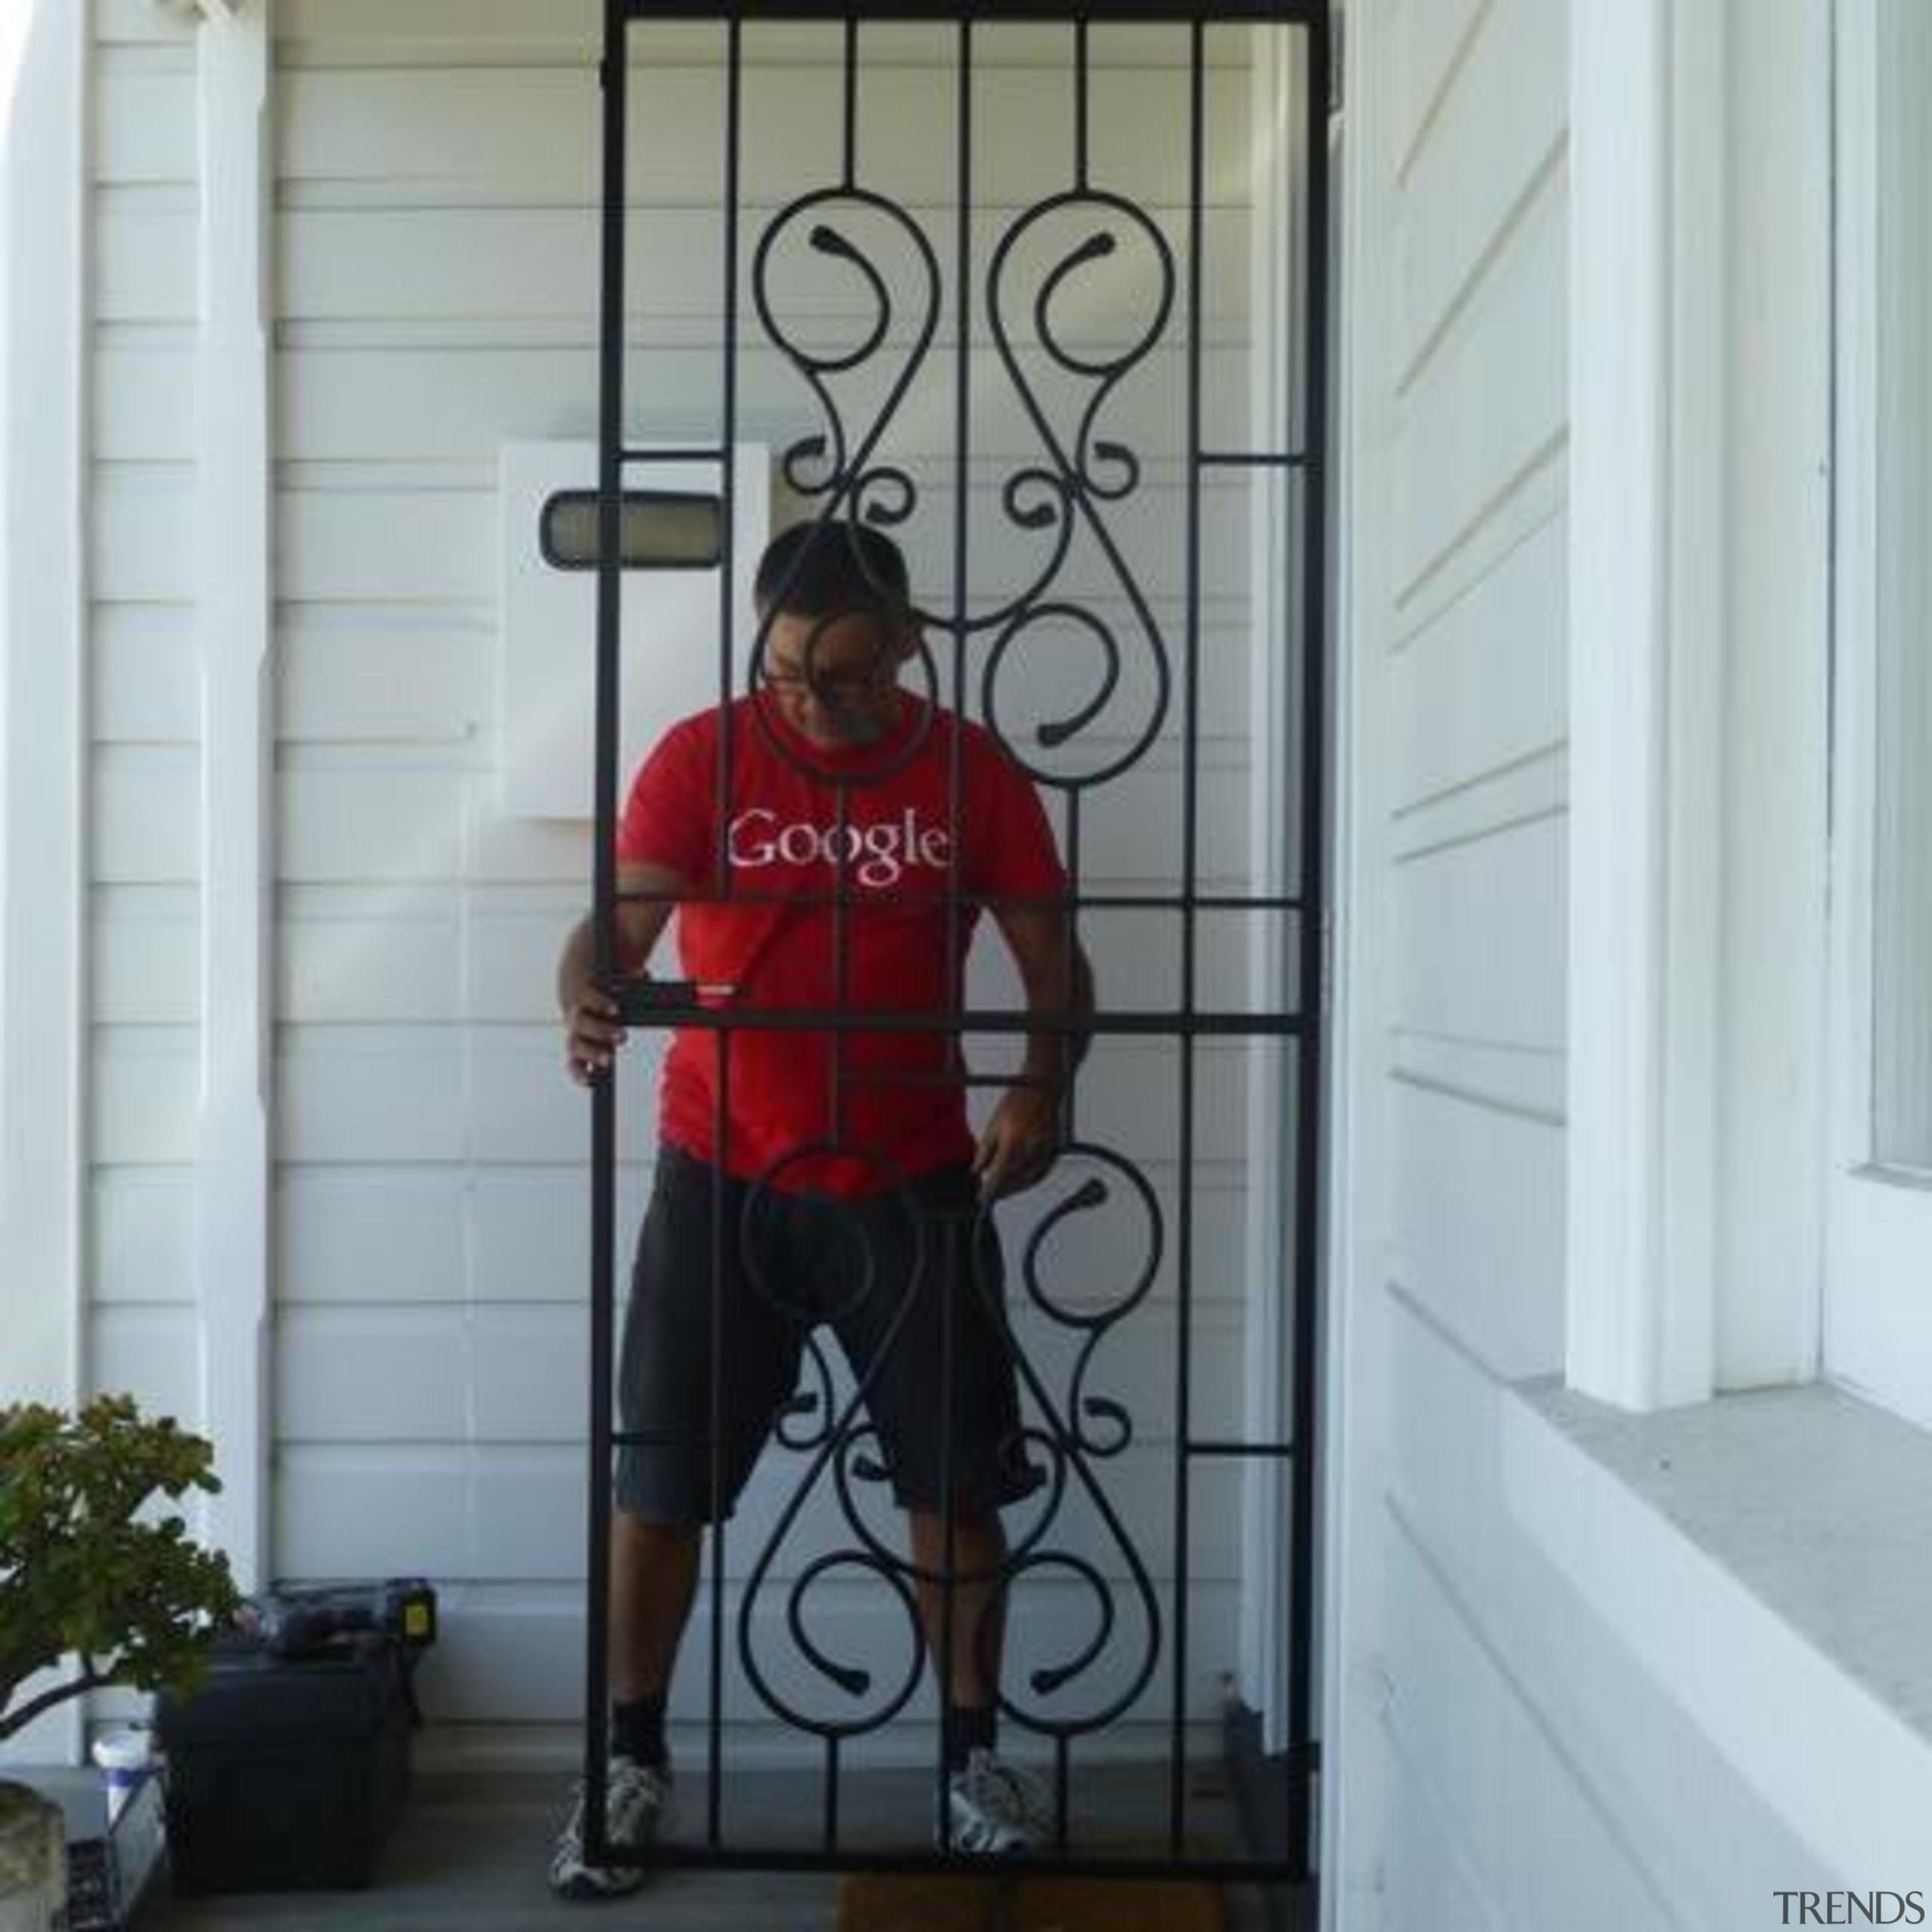 p1030606.jpeg - p1030606.jpeg - door | glass | door, glass, iron, outerwear, red, shoulder, standing, structure, window, gray